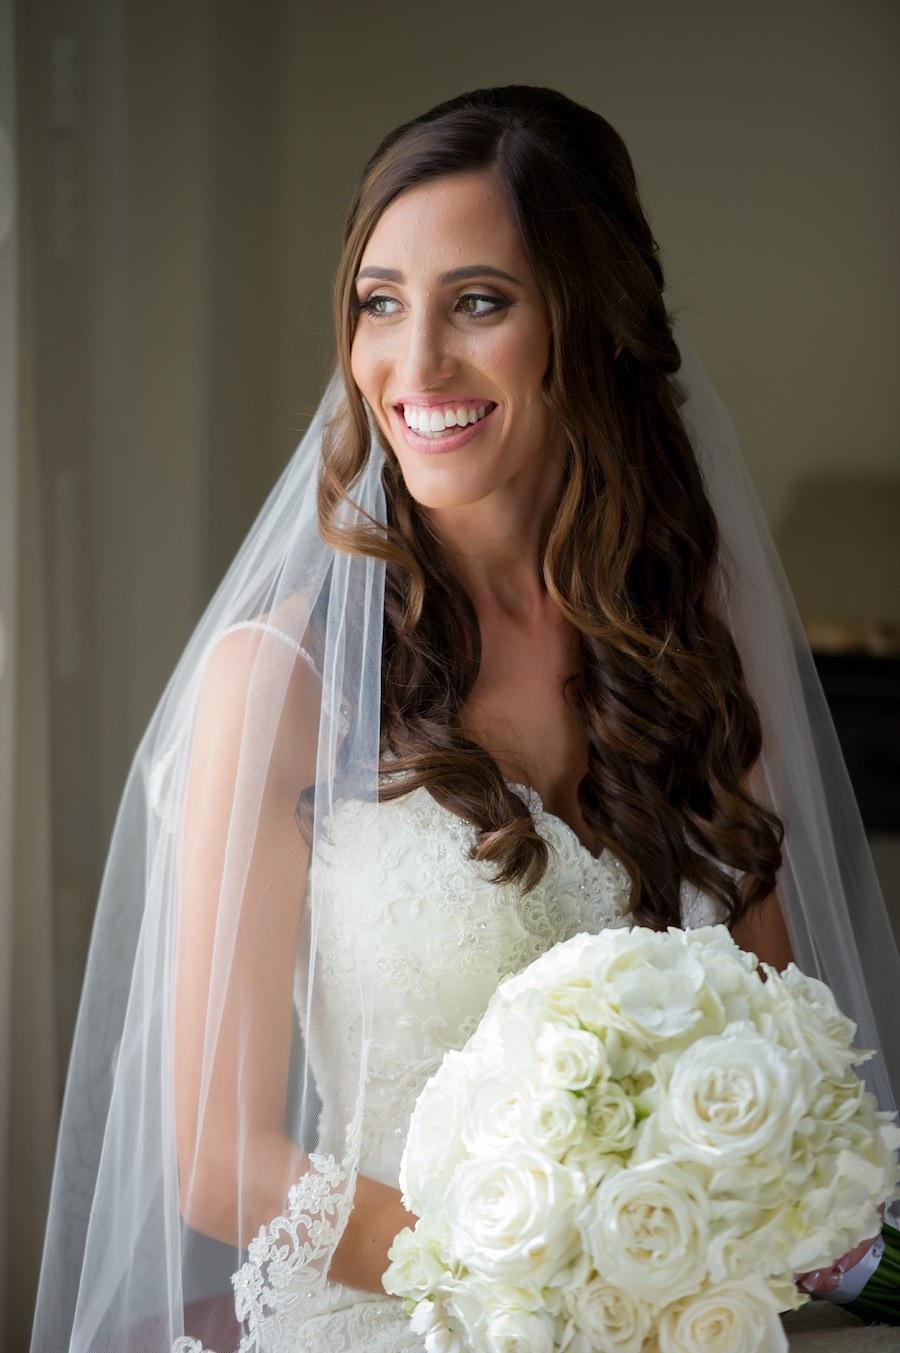 Bridal Wedding Portrait of Bride in Ivory Wedding Dress with White and Ivory Wedding Bouquet | St. Petersburg Wedding Photographer Andi Diamond Photography